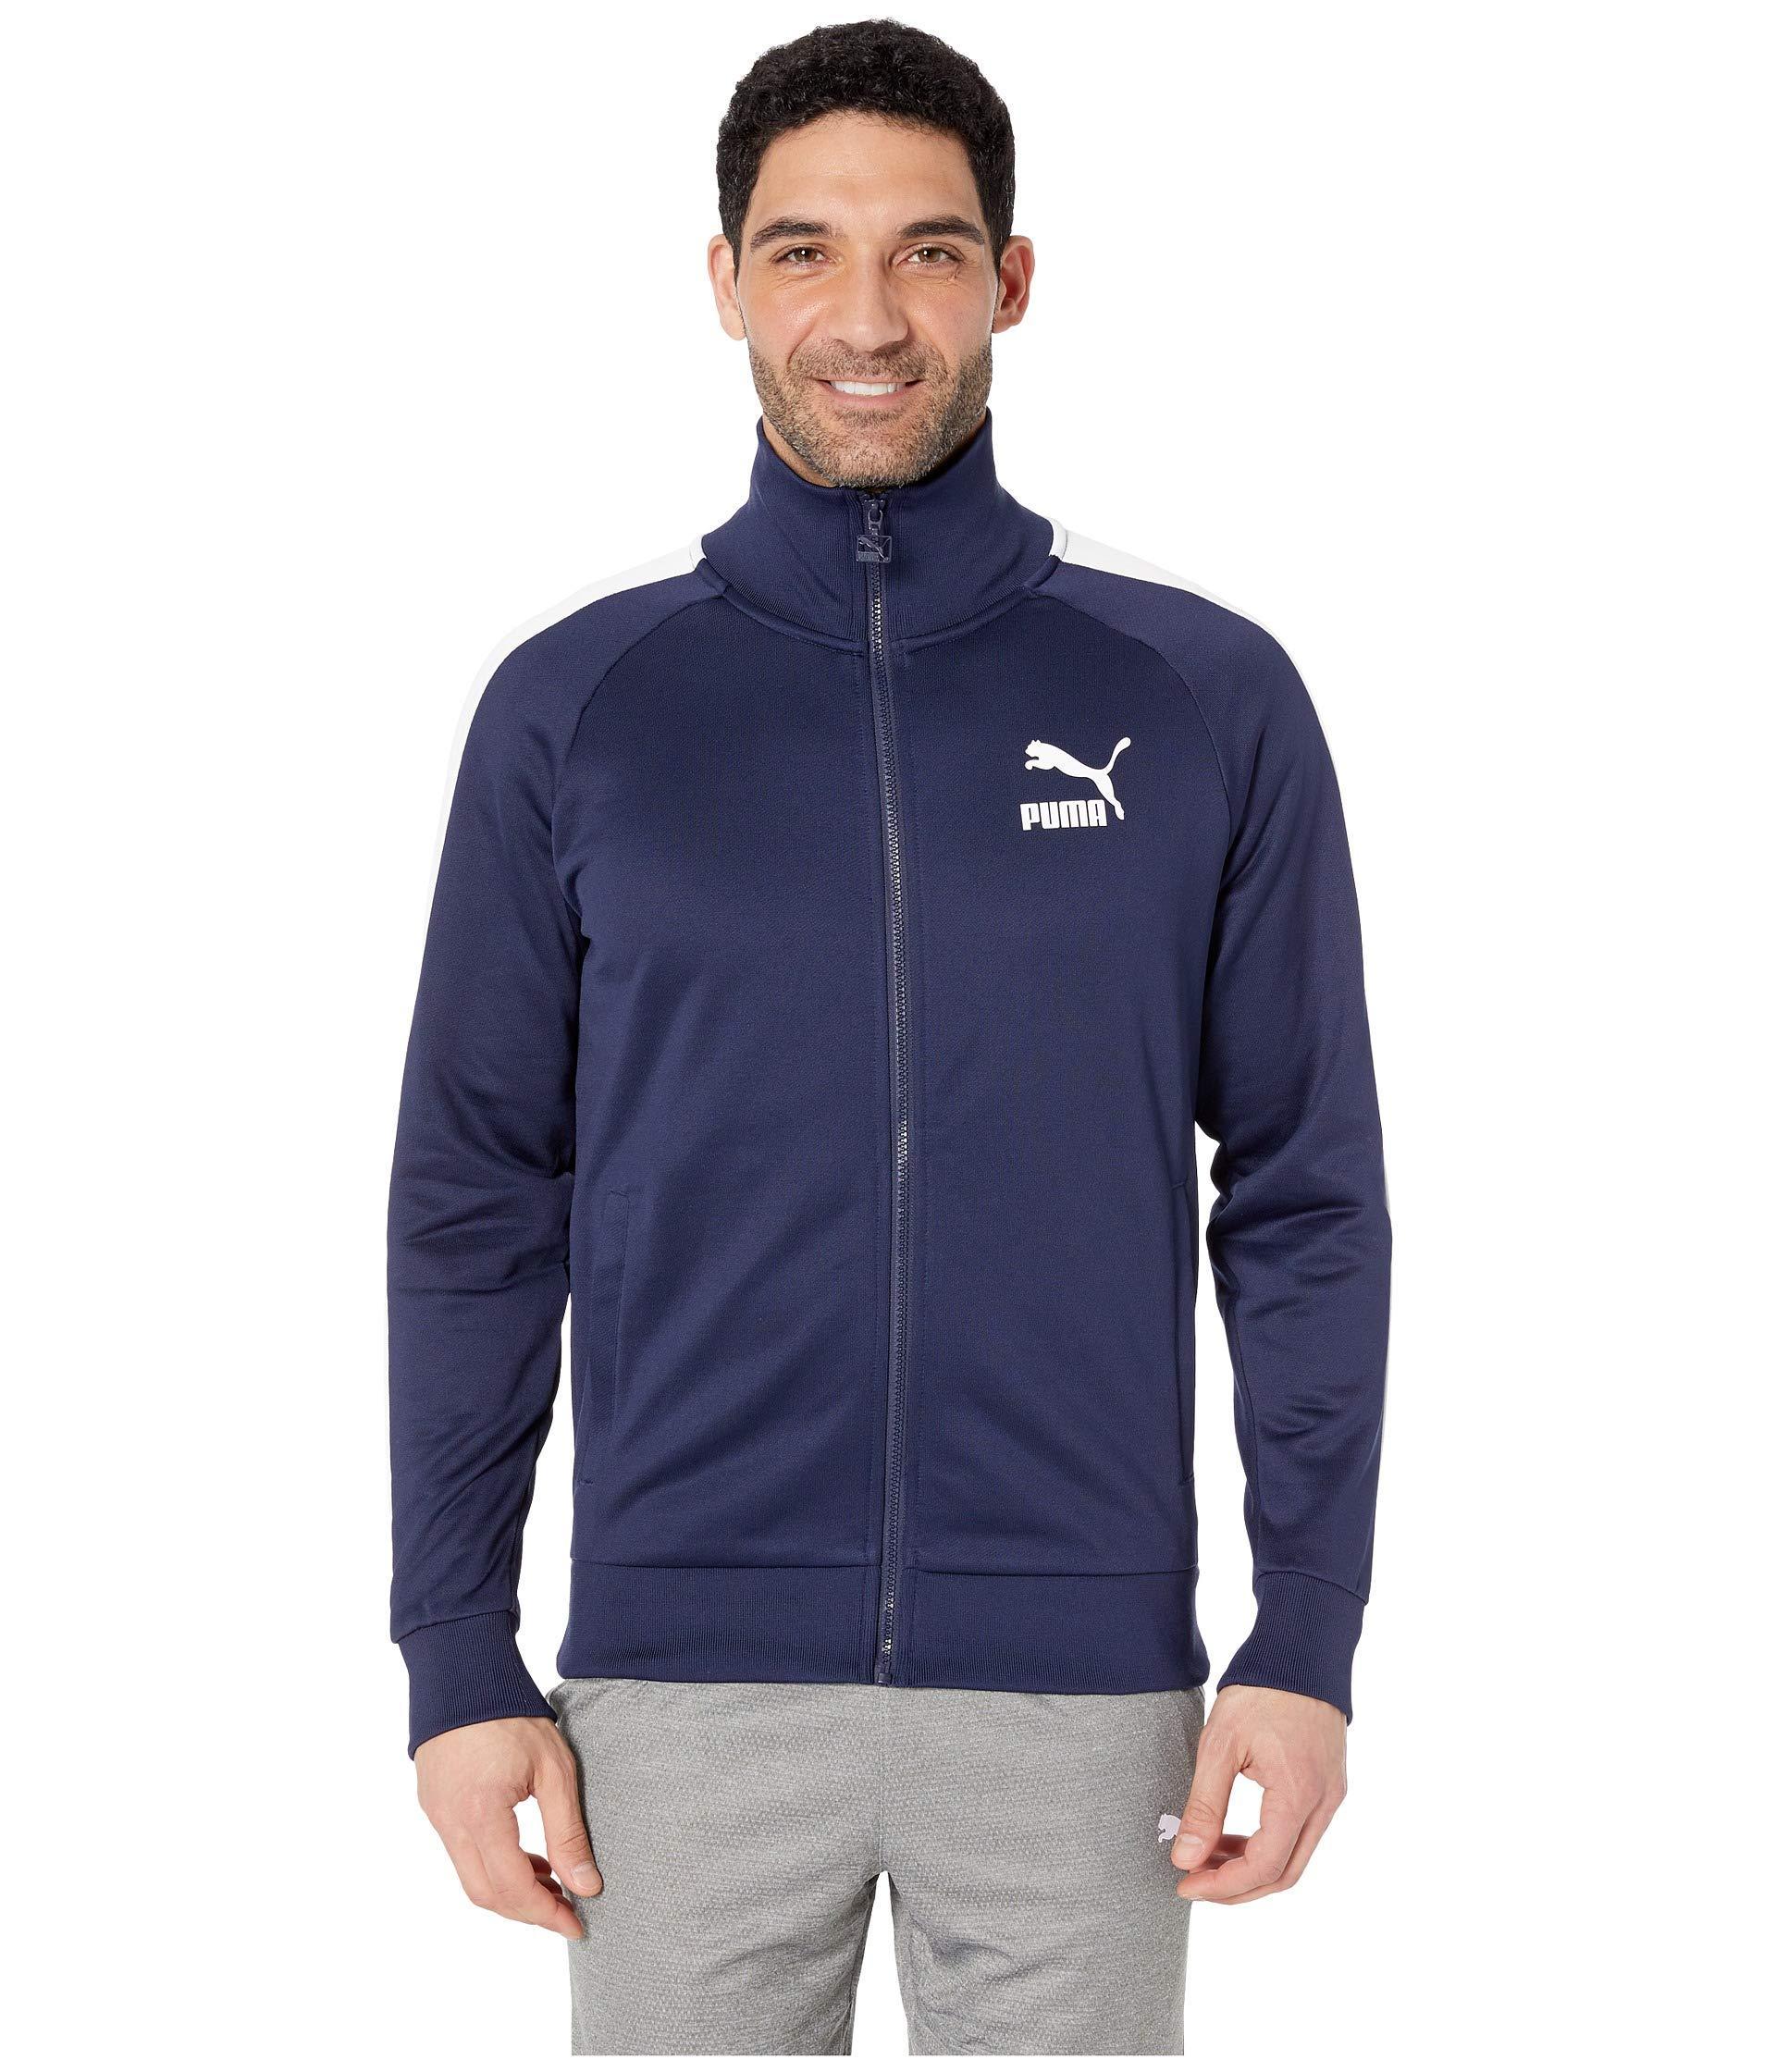 8afb31e288d0 PUMA - Blue Iconic T7 Track Jacket for Men - Lyst. View fullscreen